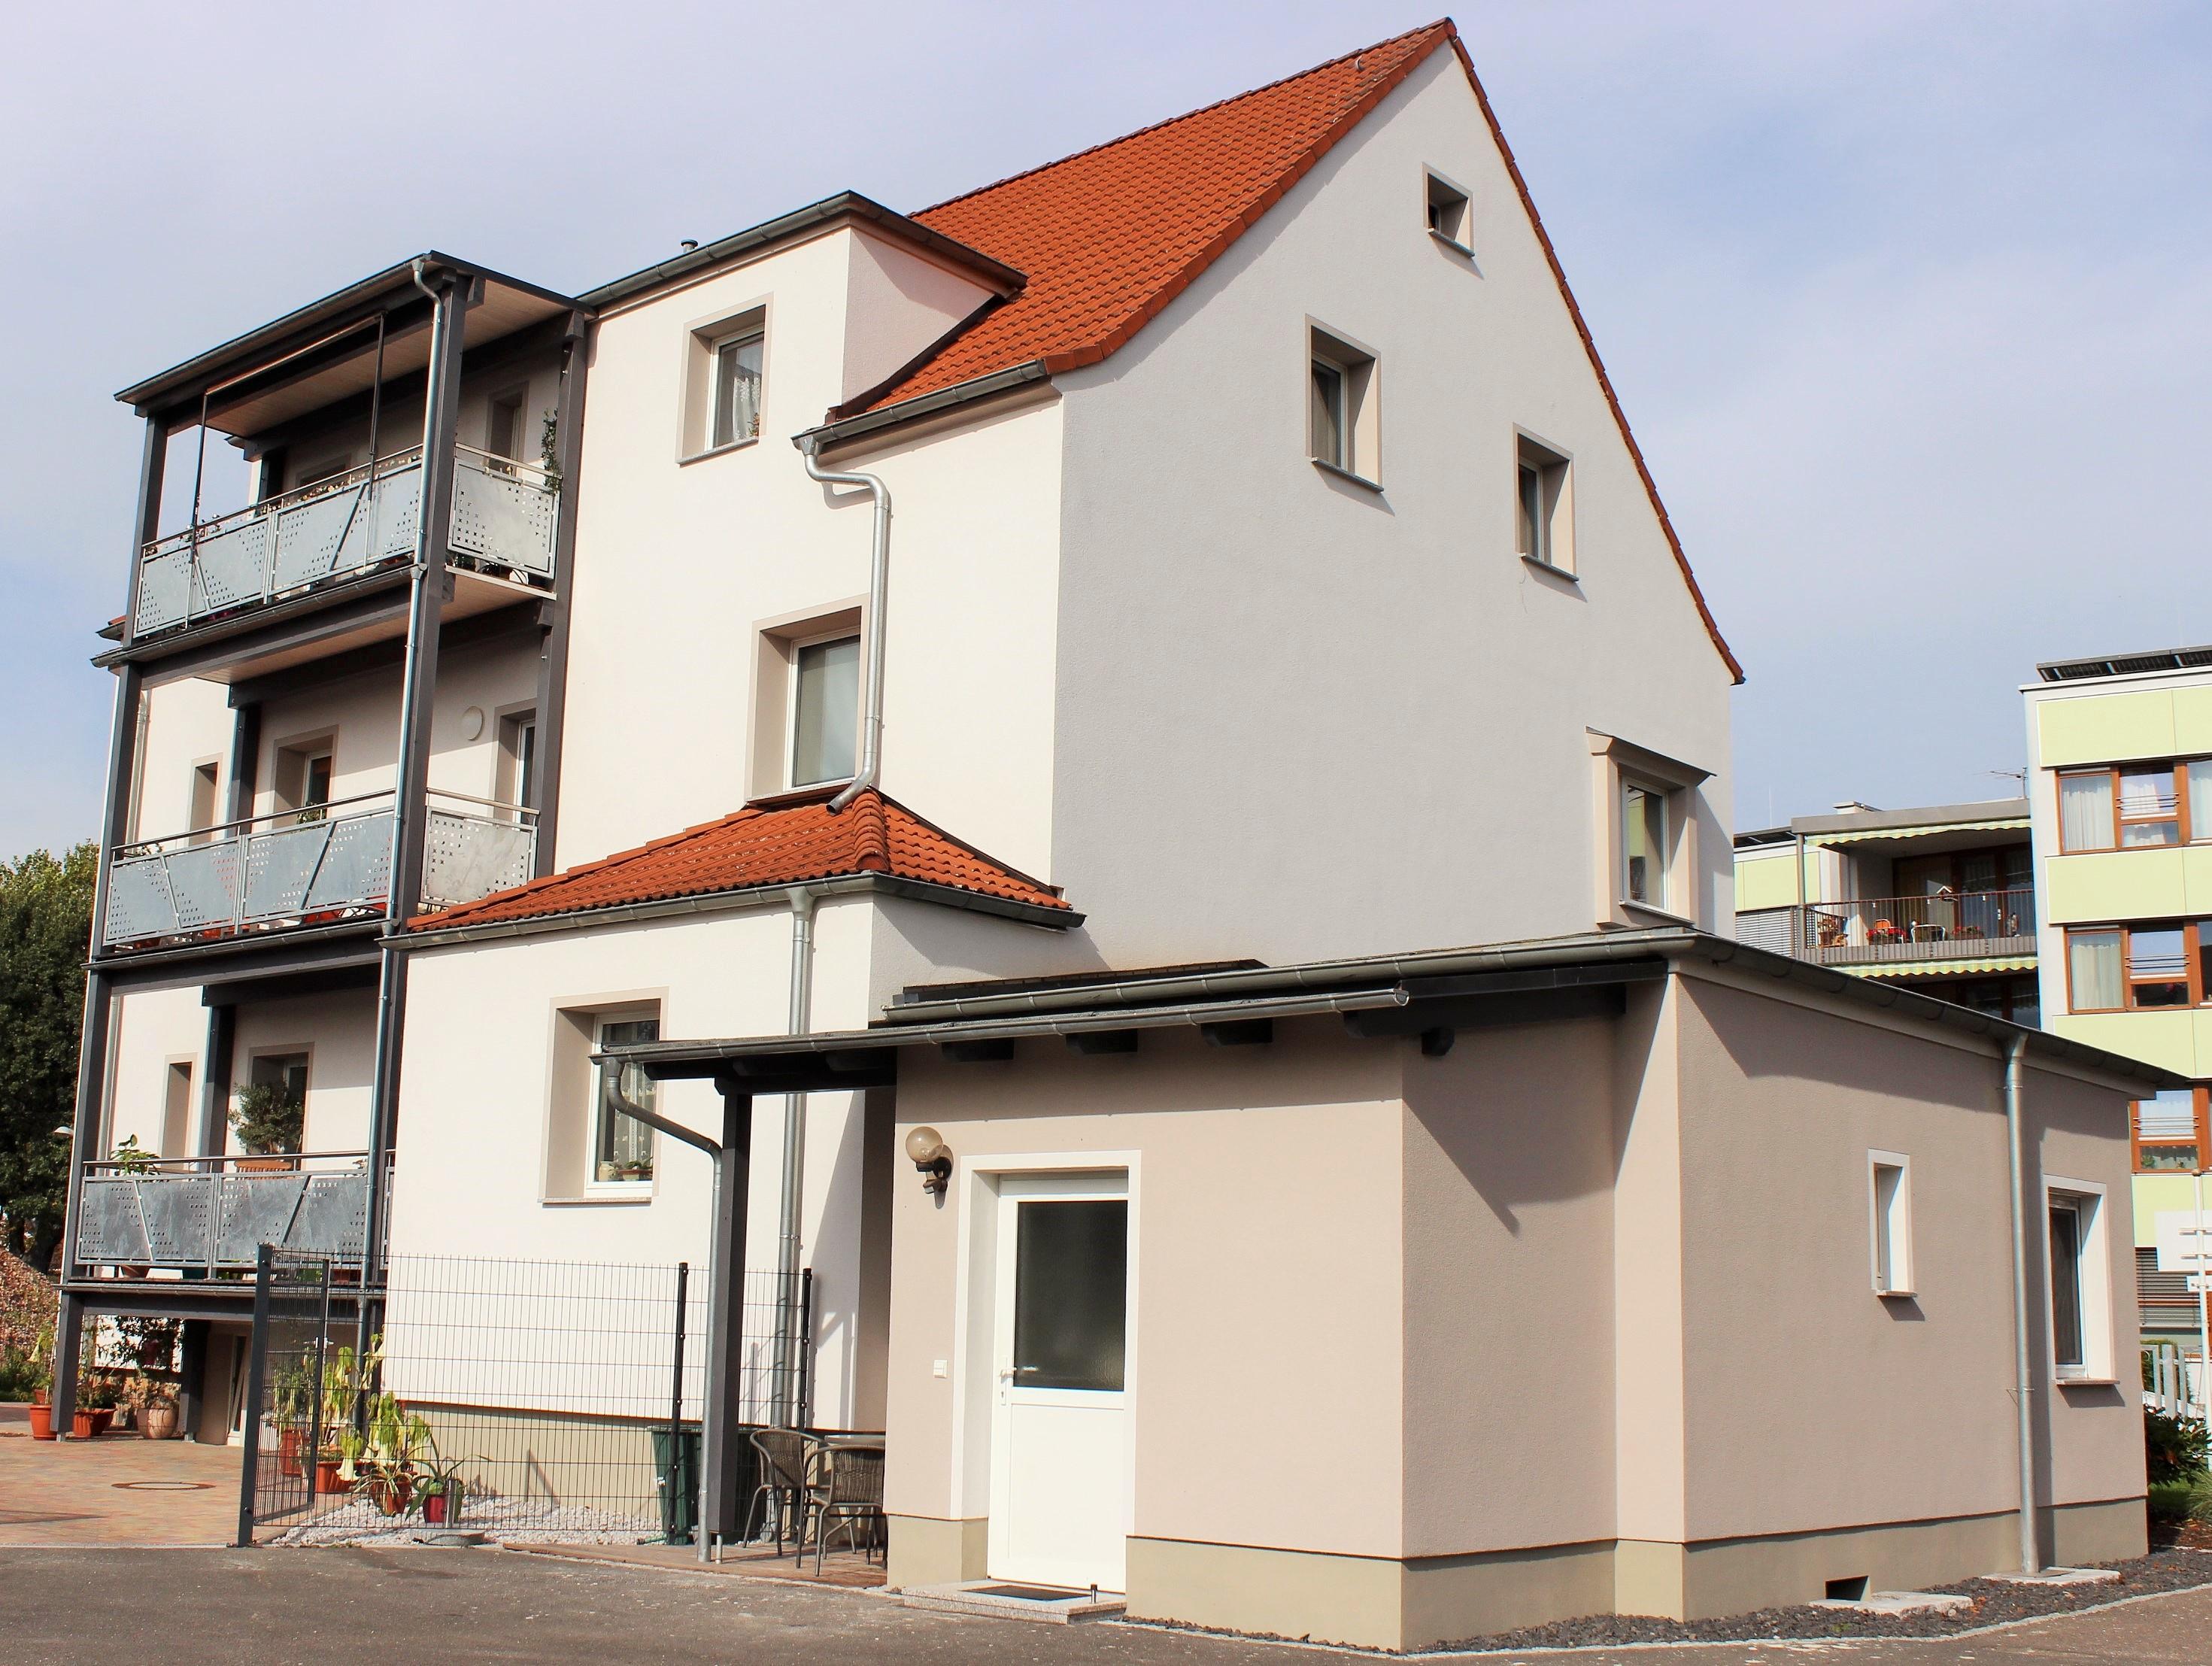 Fassadensanierung WDVS in Borna Rückseite